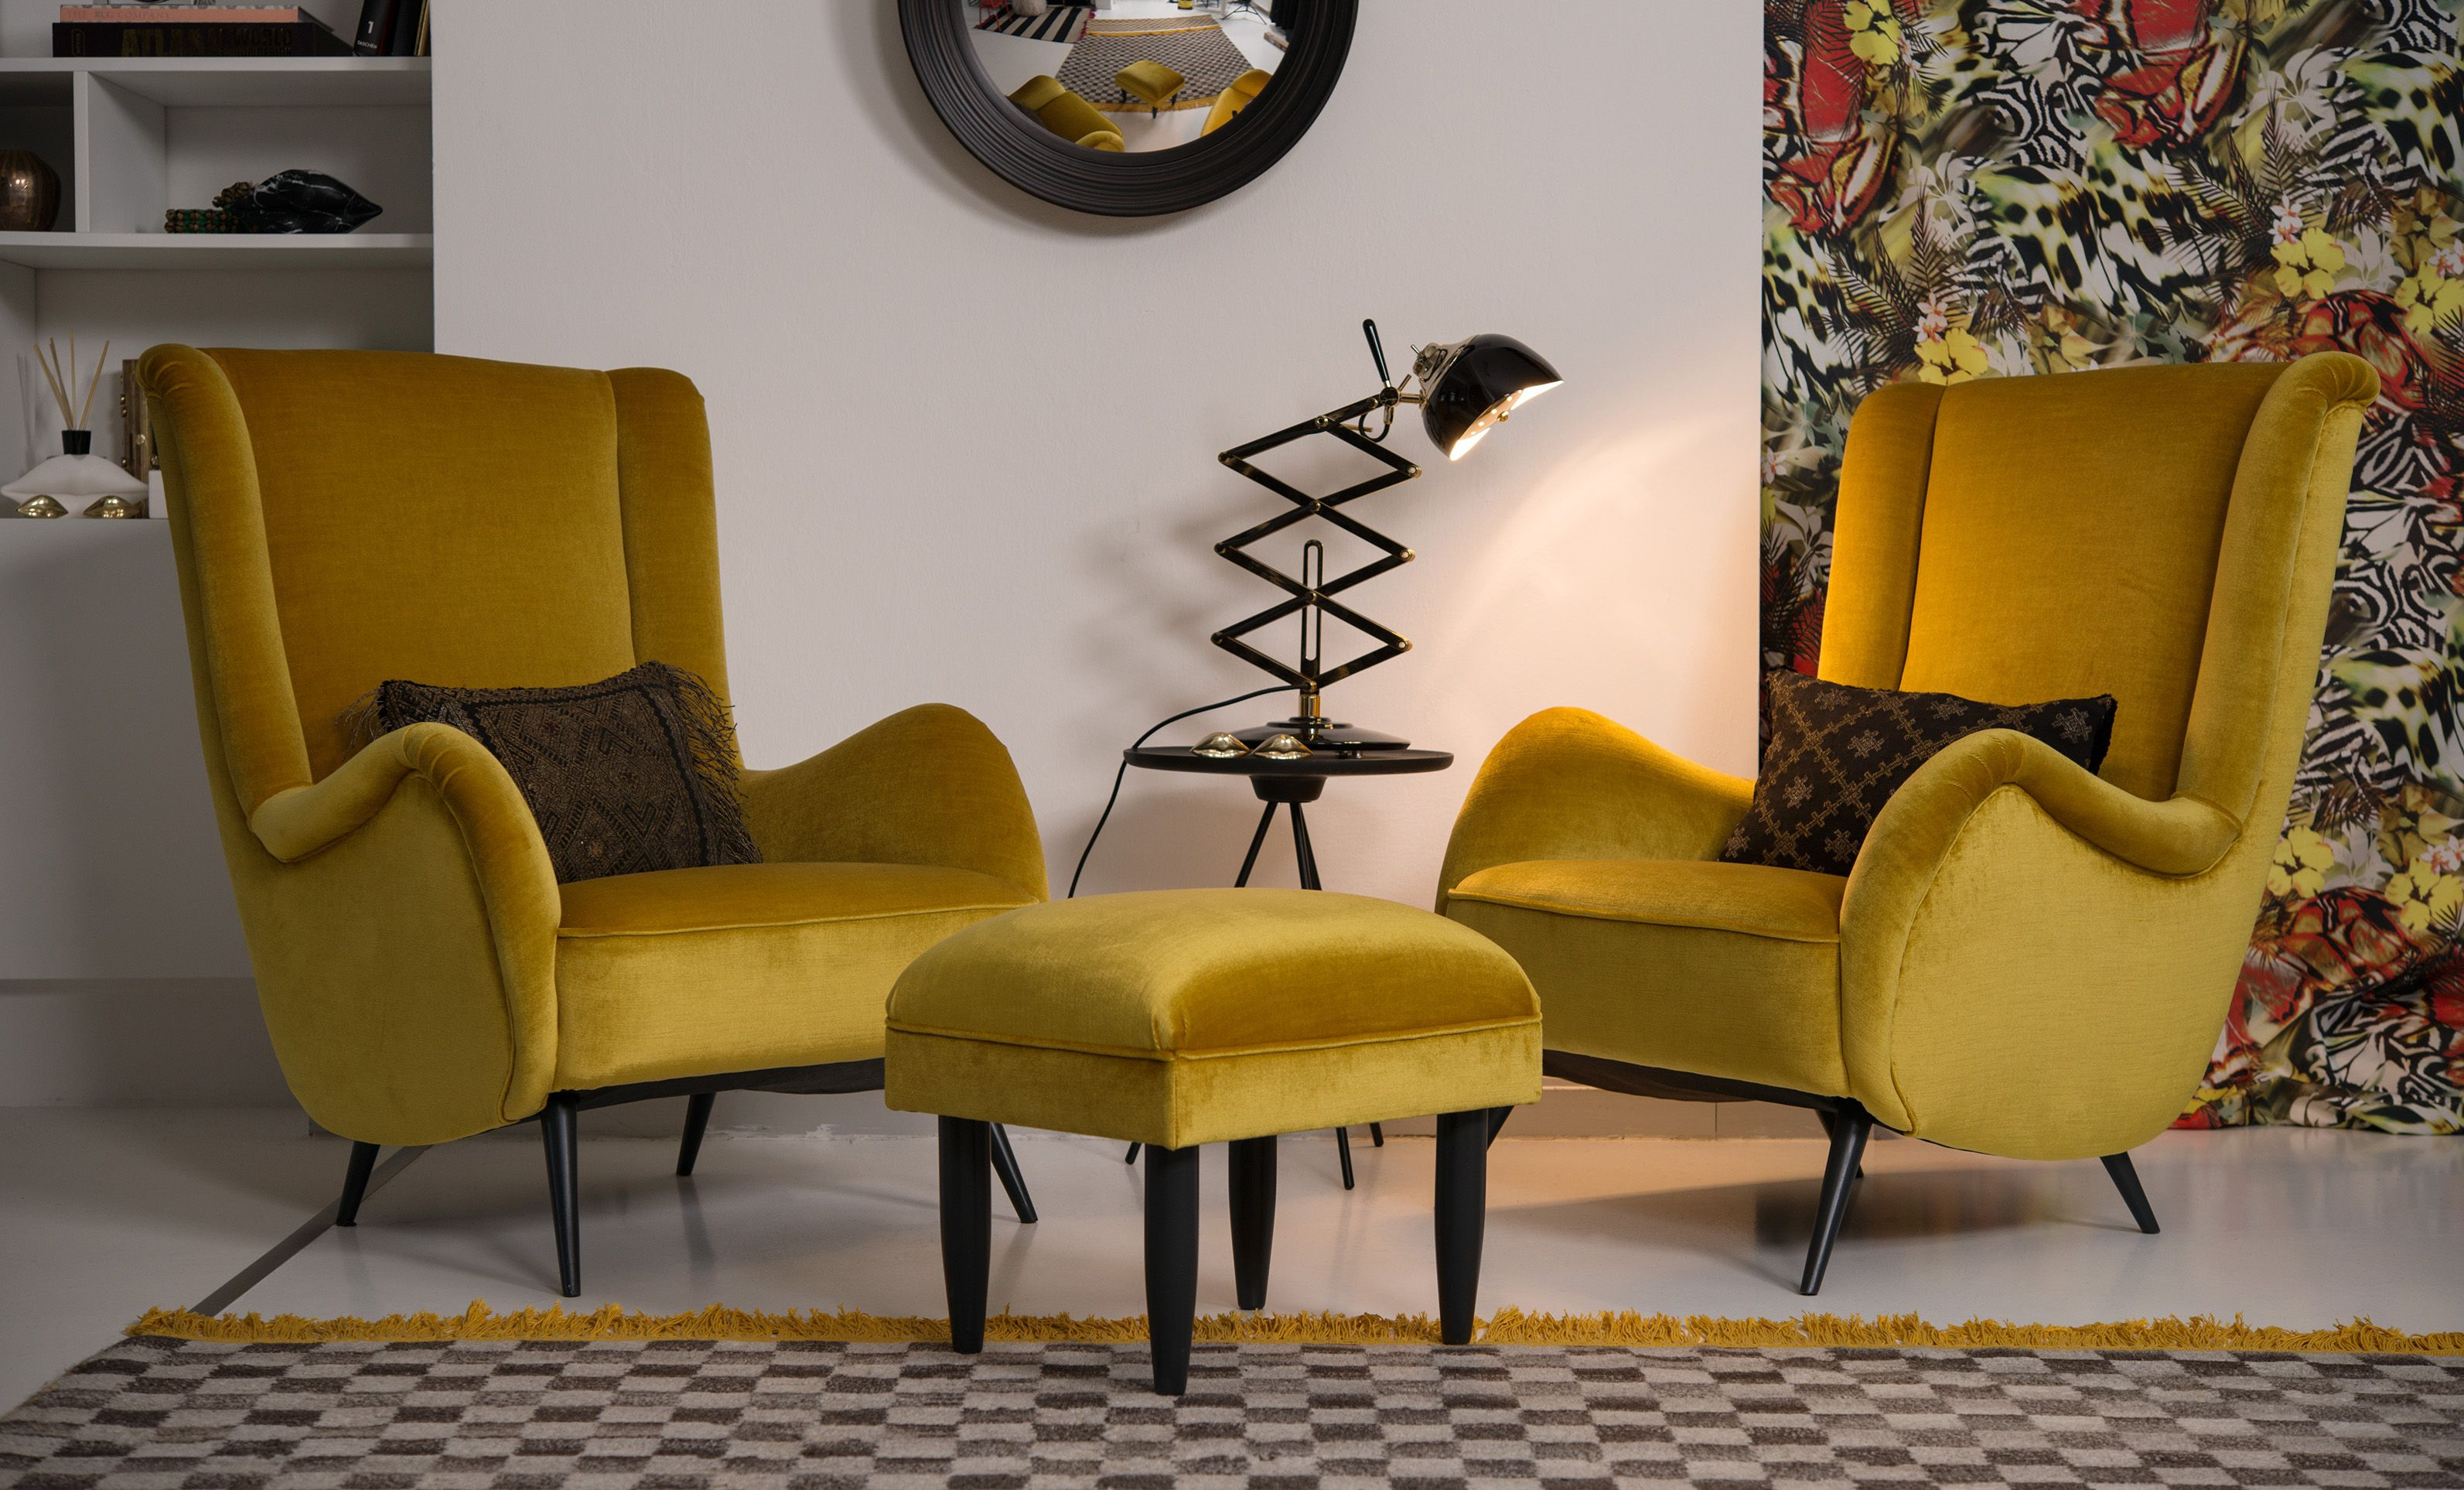 ARZU KARTAL INTERIOR STUDIO & CONCEPTS | 沙发和沙发椅 | Pinterest ...